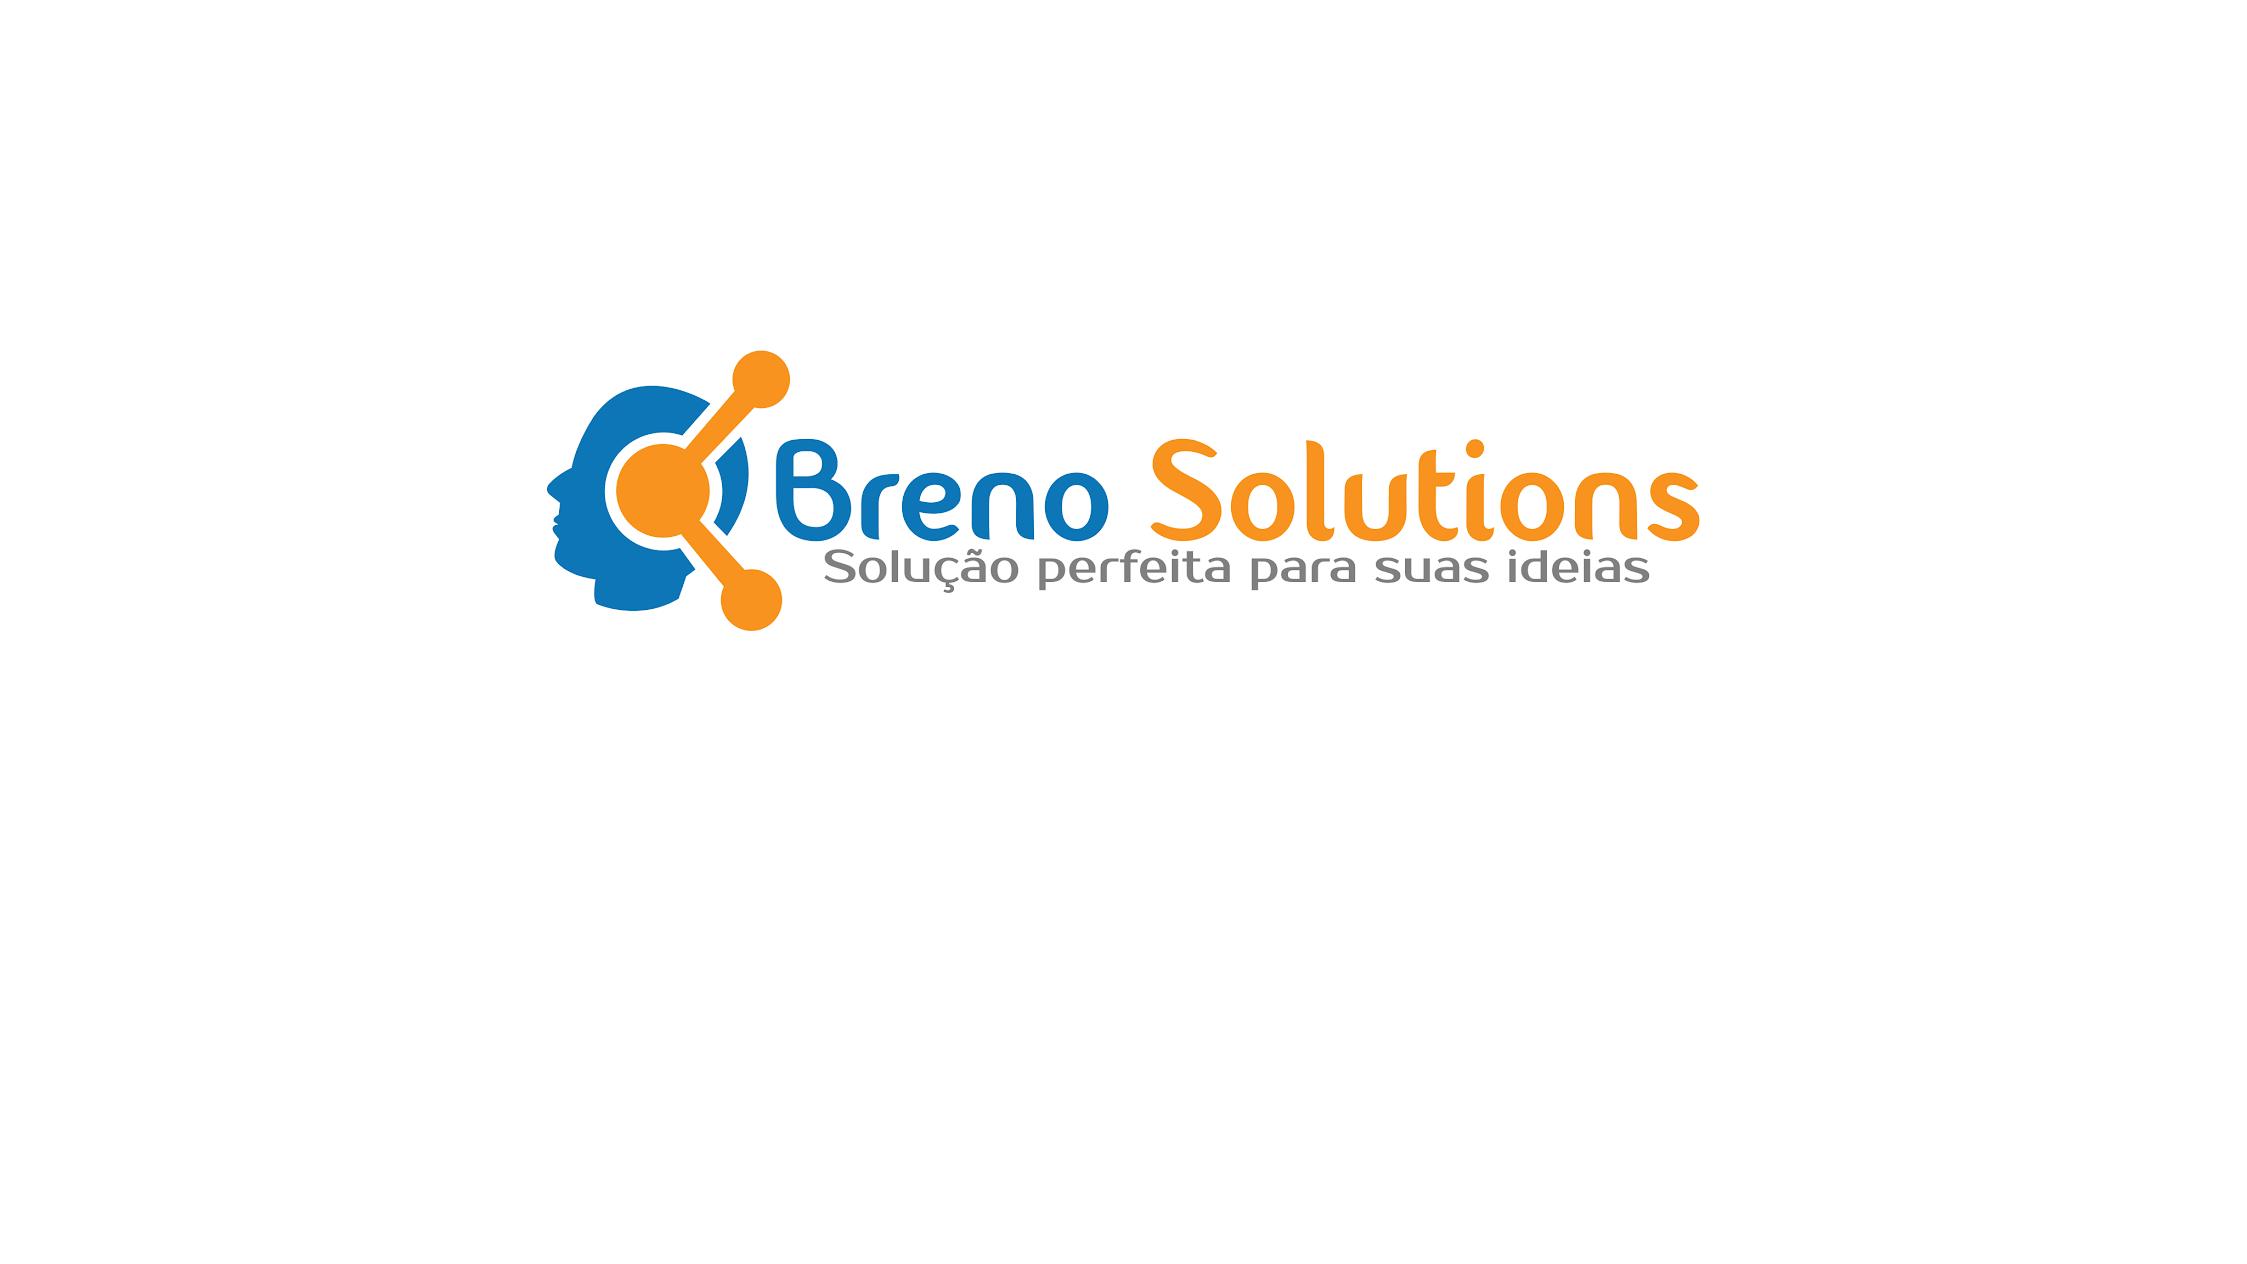 Breno Solutions